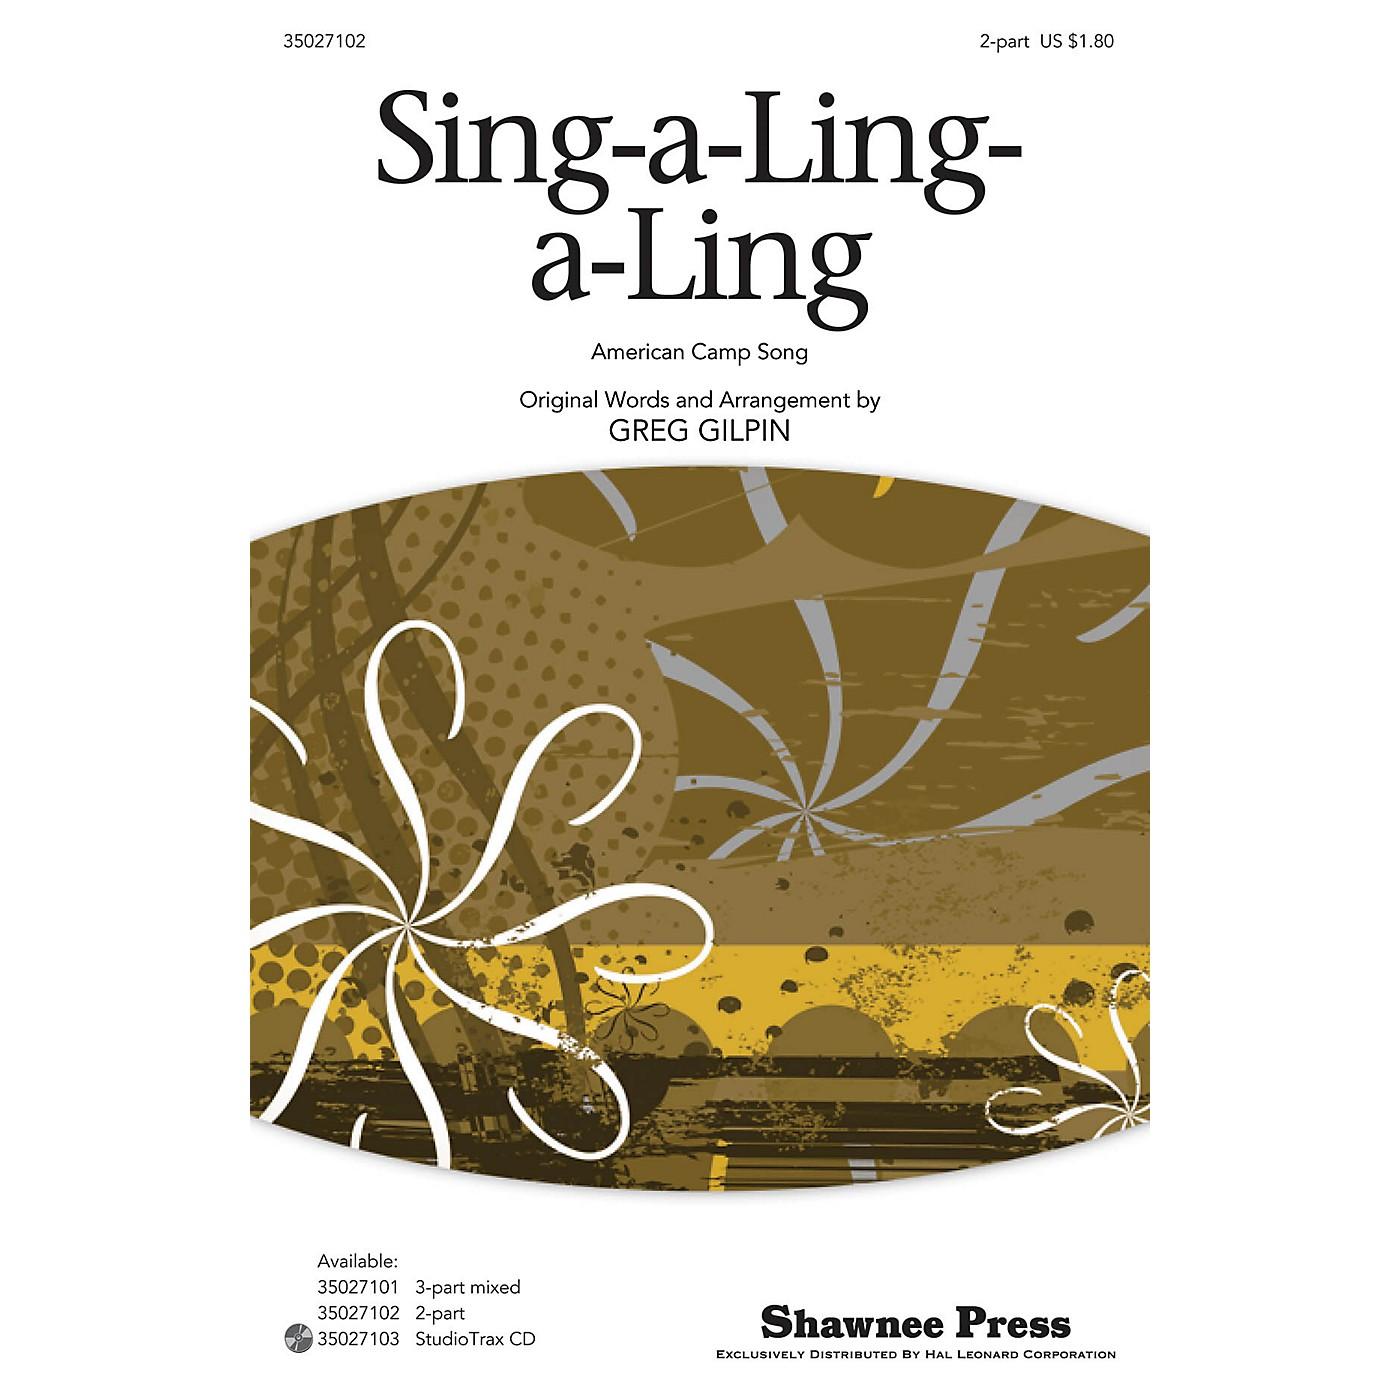 Shawnee Press Sing-a-Ling-a-Ling 2-Part thumbnail